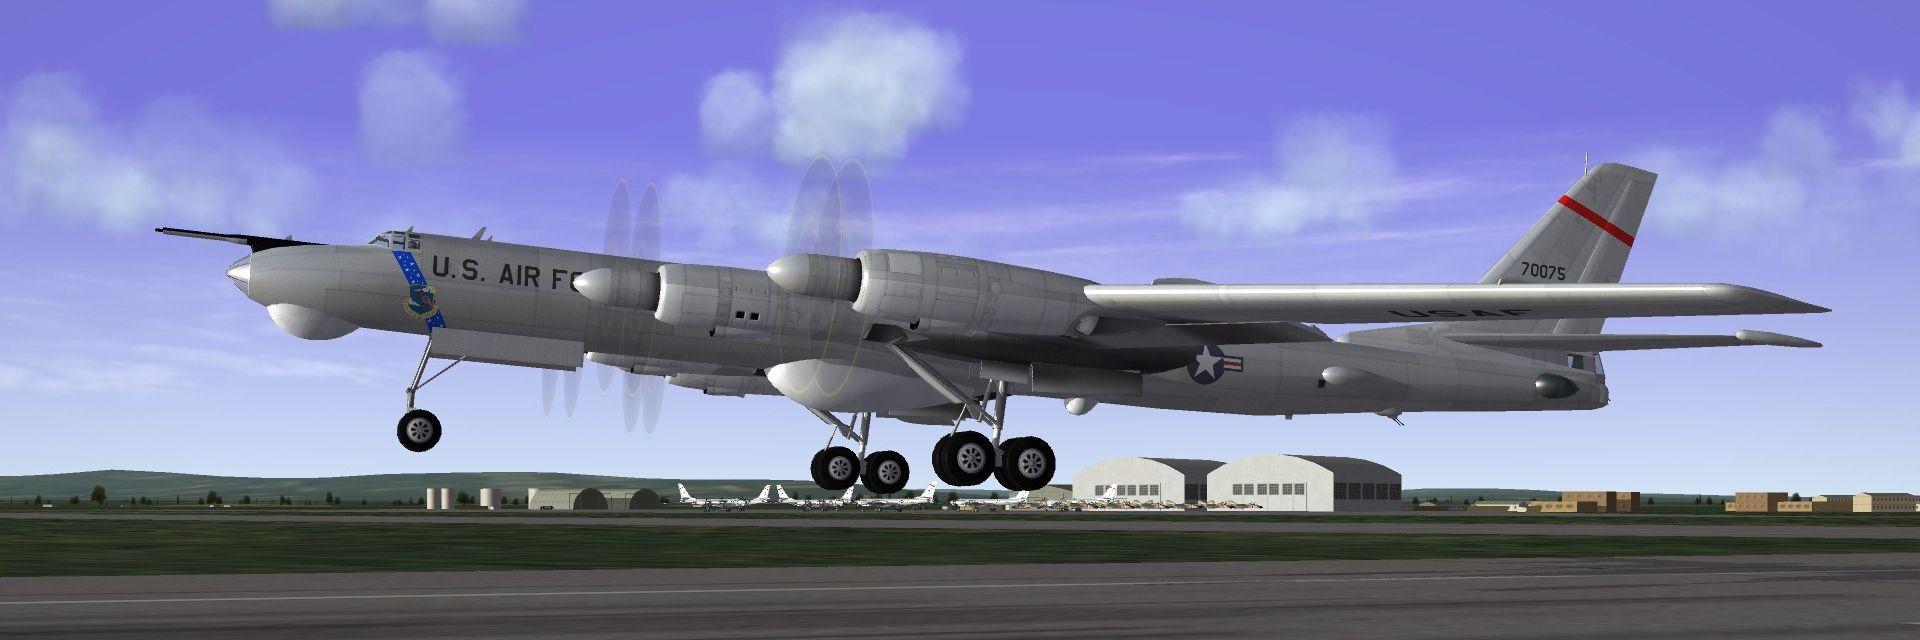 USAFRB-55DSTRATOSTRIKE02_zpsb186808d.jpg